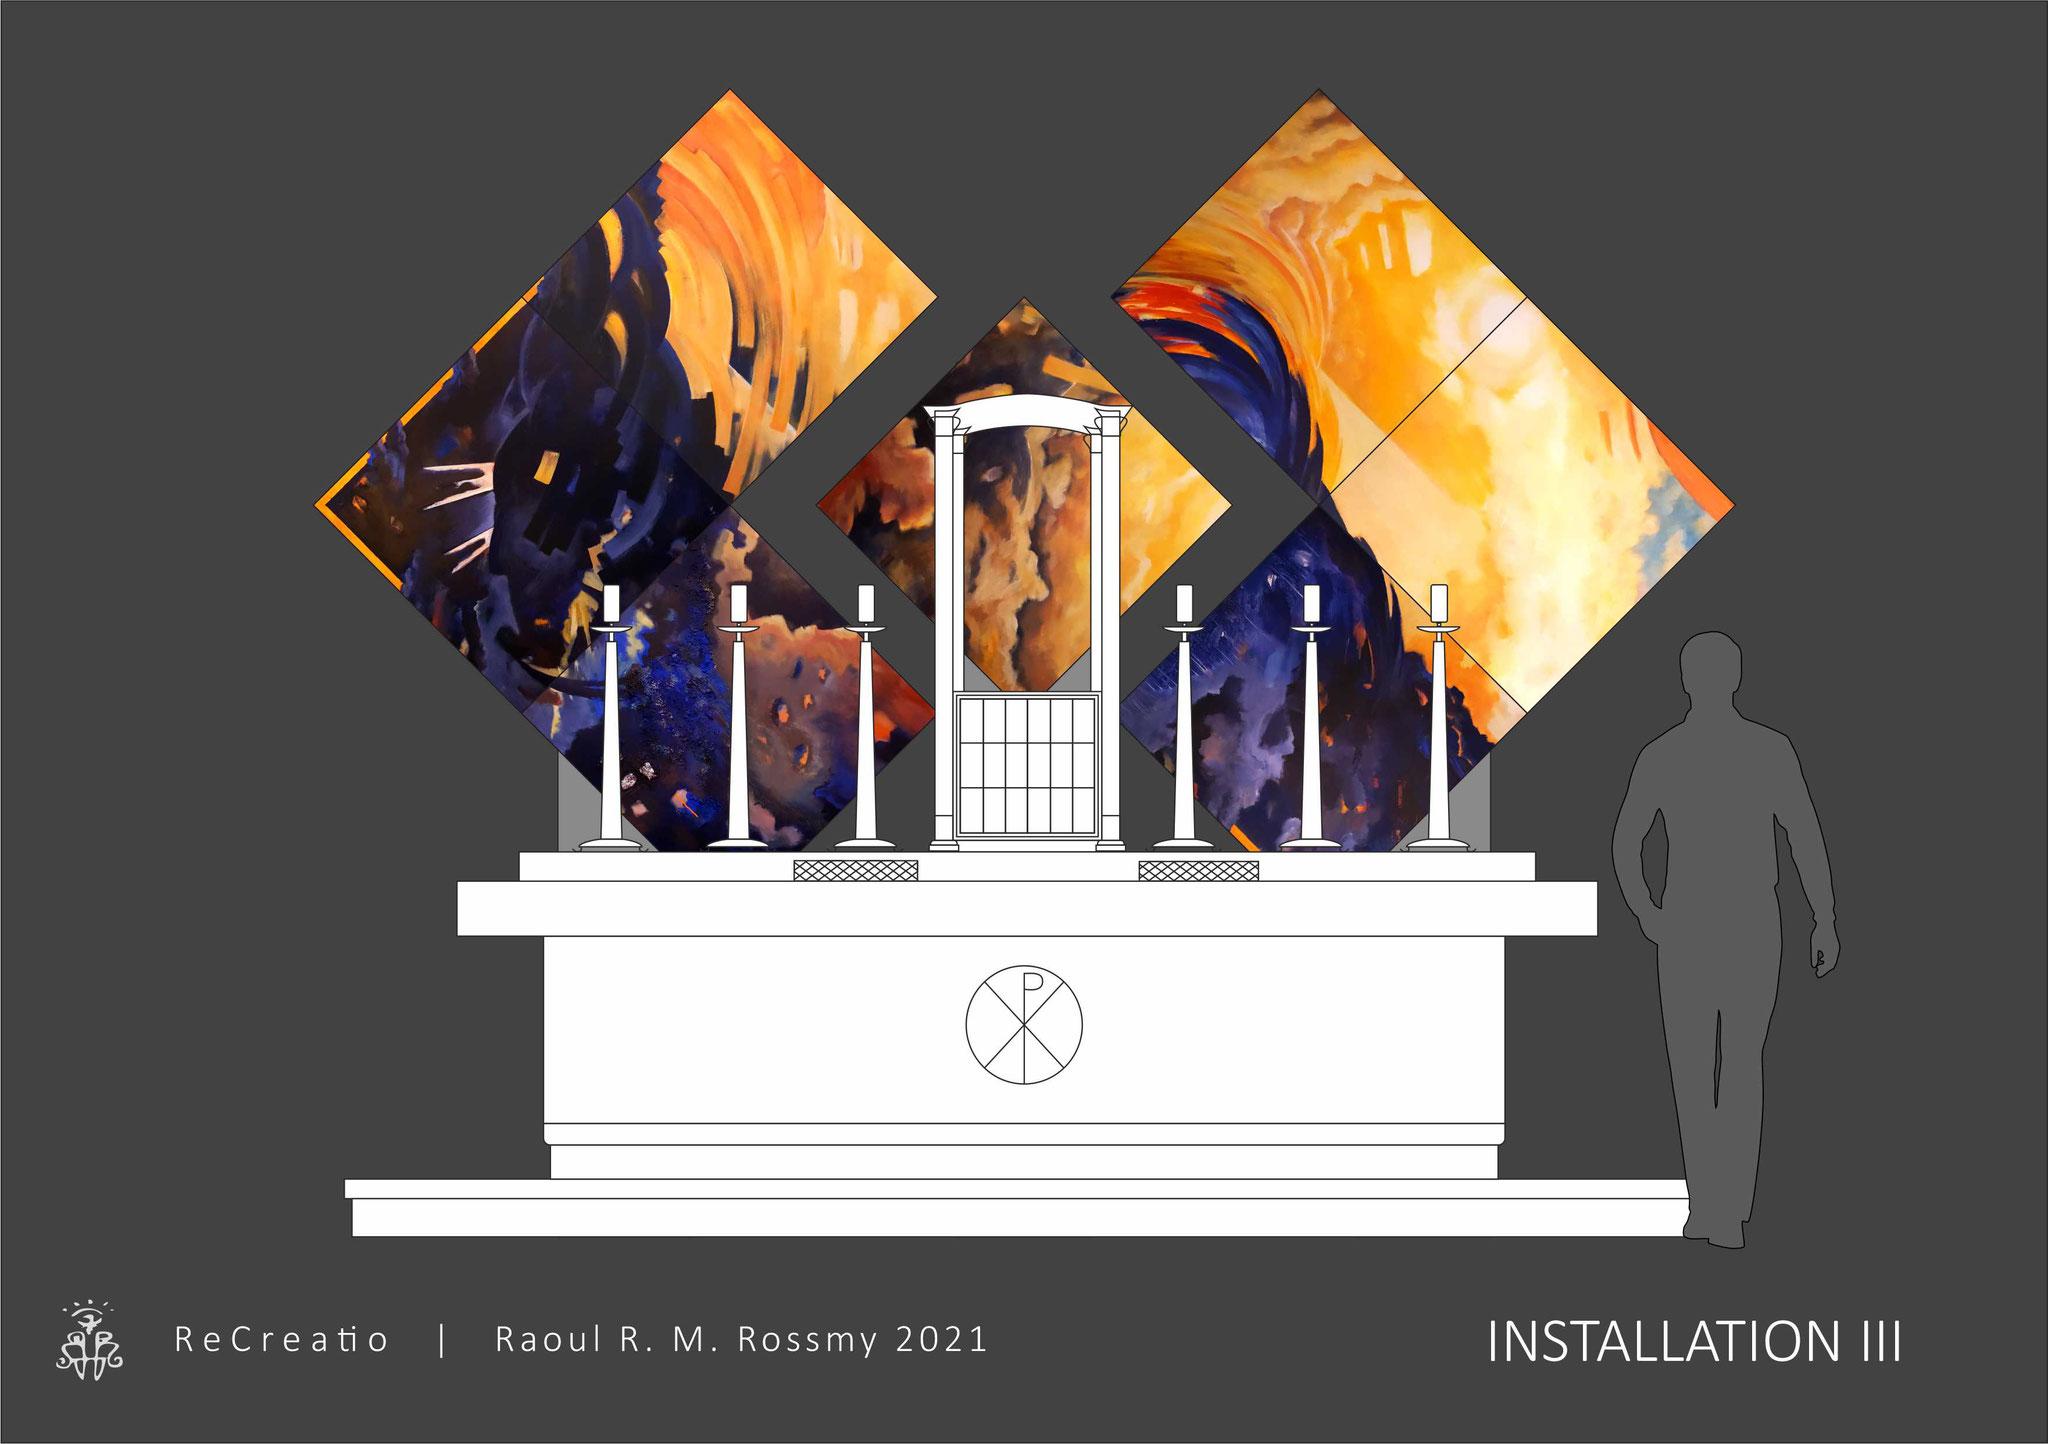 ReCreatio | Raoul R. M. Rossmy 2021 | Installation III